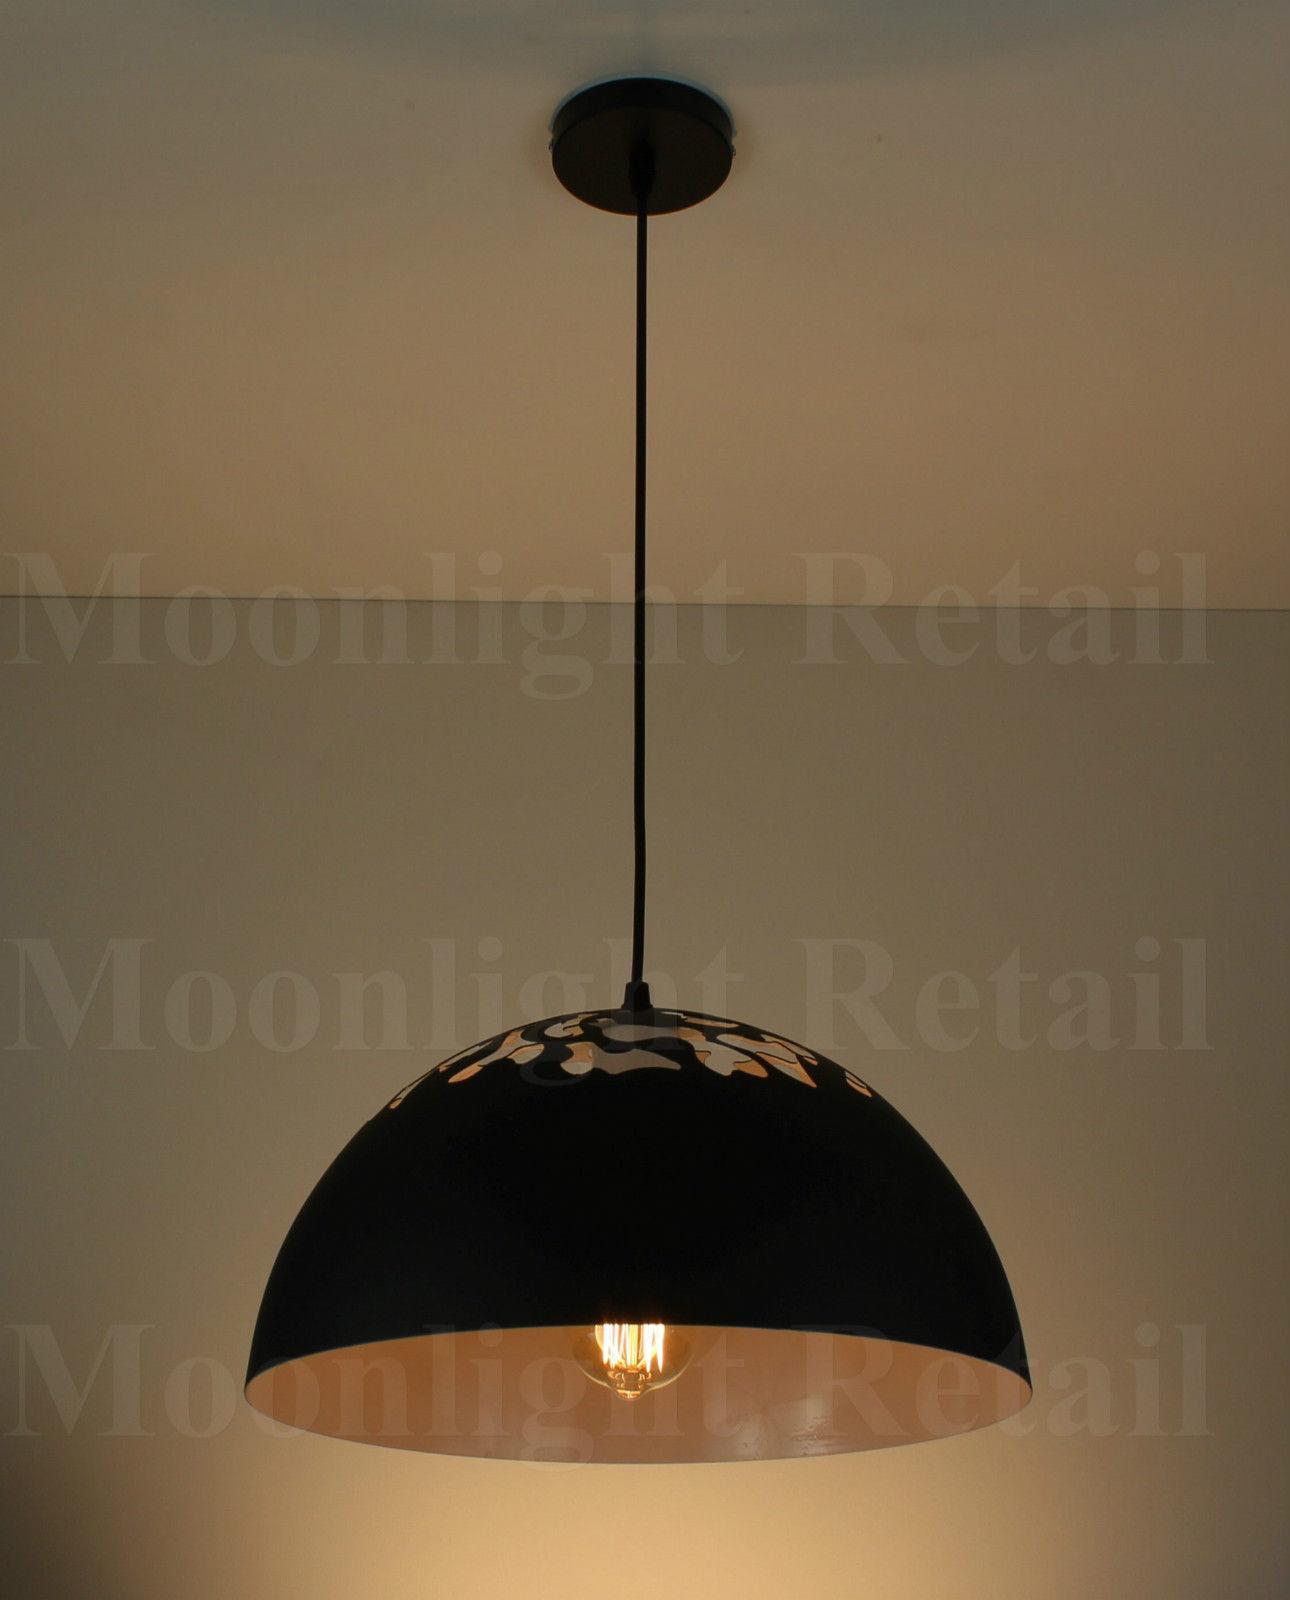 Vintage Industrial Metal Black Cut Out Shade Cafe Loft Pendant Light Lamp Shade Moonlight Retail